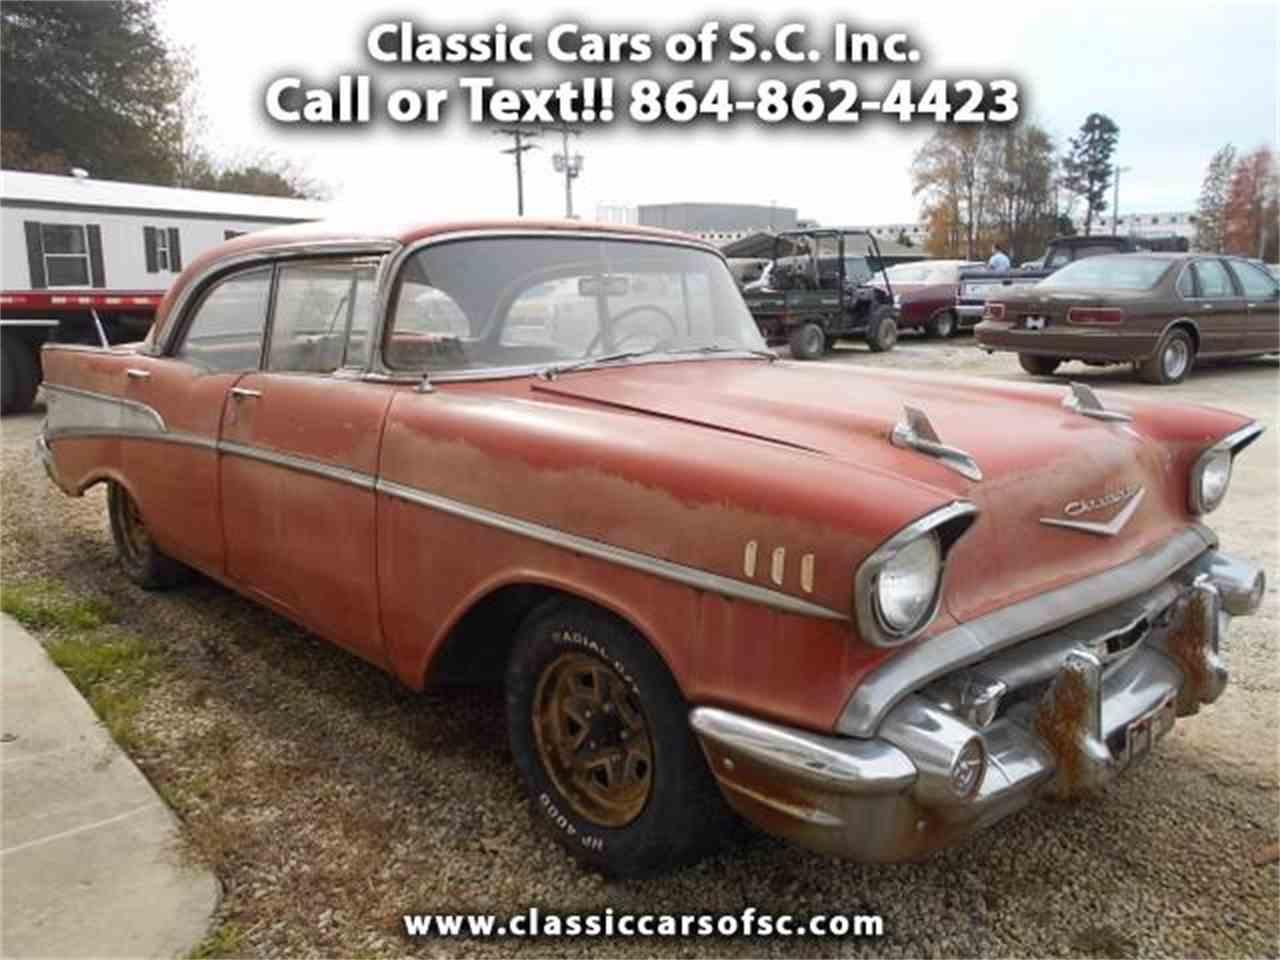 1957 Chevrolet Bel Air for Sale   ClassicCars.com   CC-761634